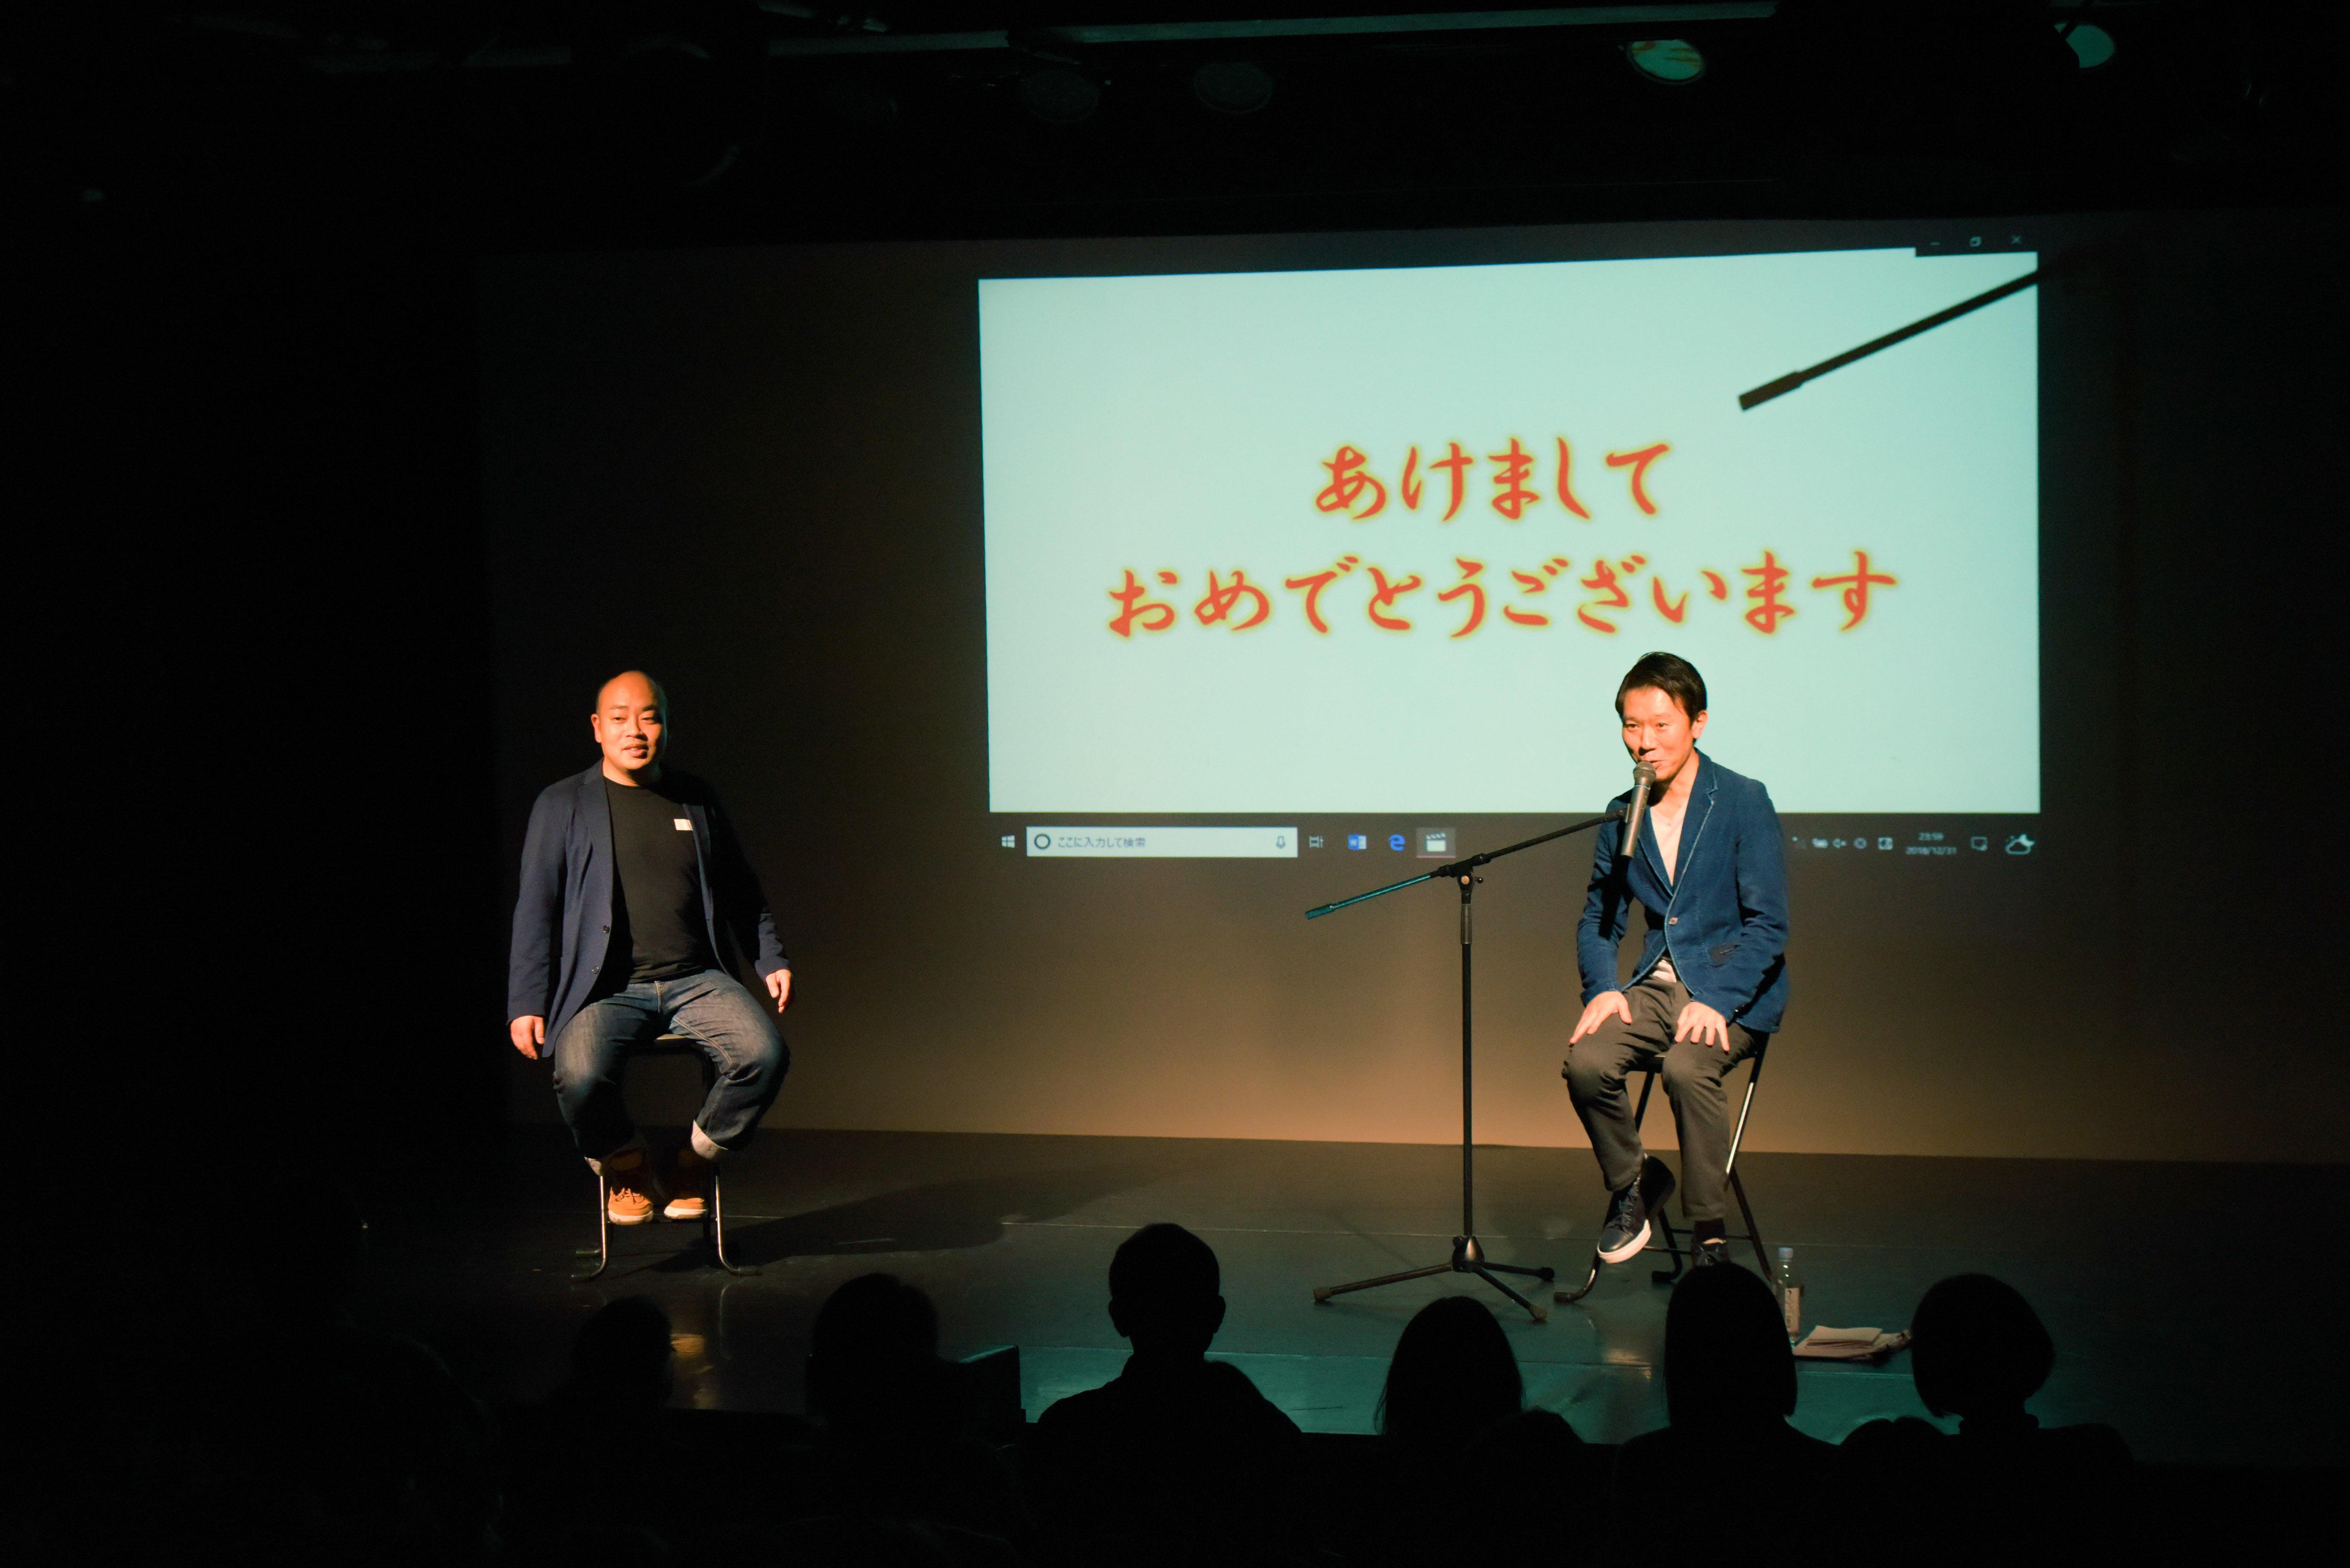 http://news.yoshimoto.co.jp/20190101120618-40e8c25aecb82bd23a98da2378cc16a19b98e29d.jpg